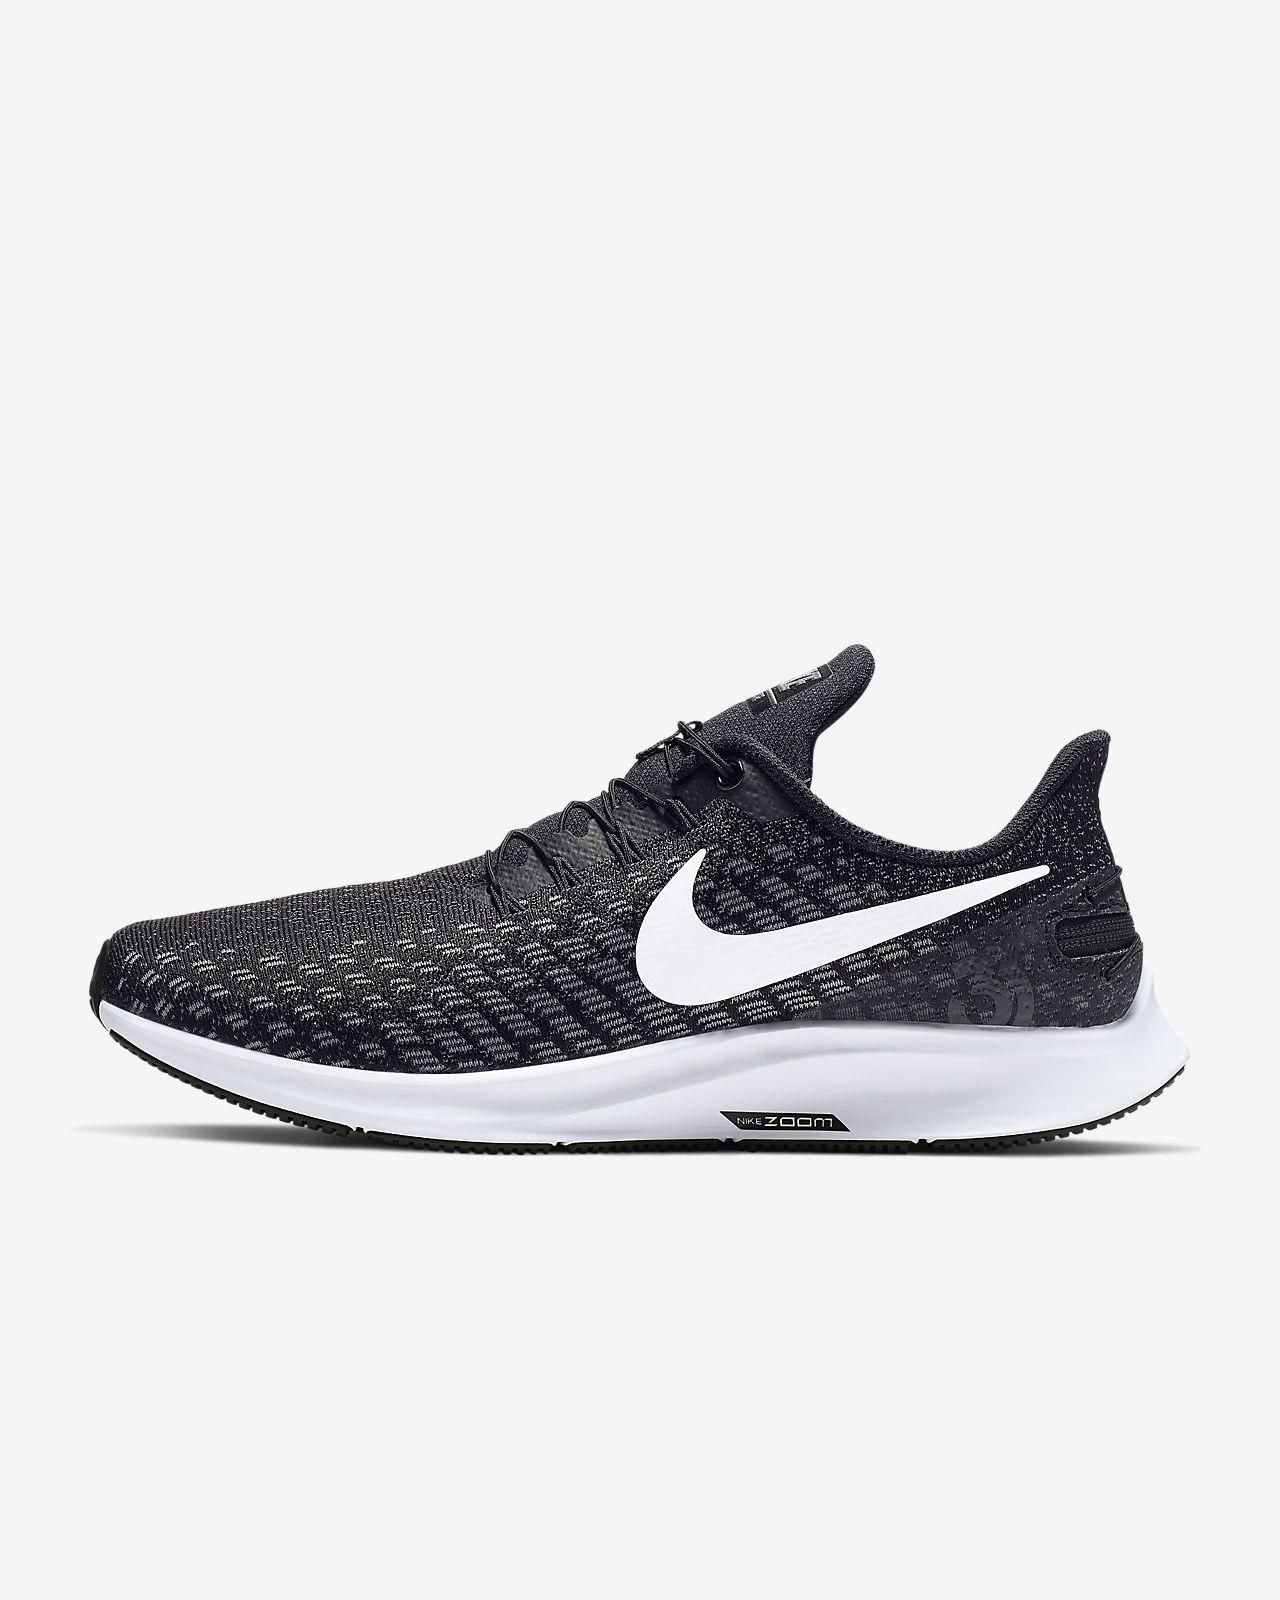 Chaussure de running Nike Air Zoom Pegasus 35 FlyEase pour Femme